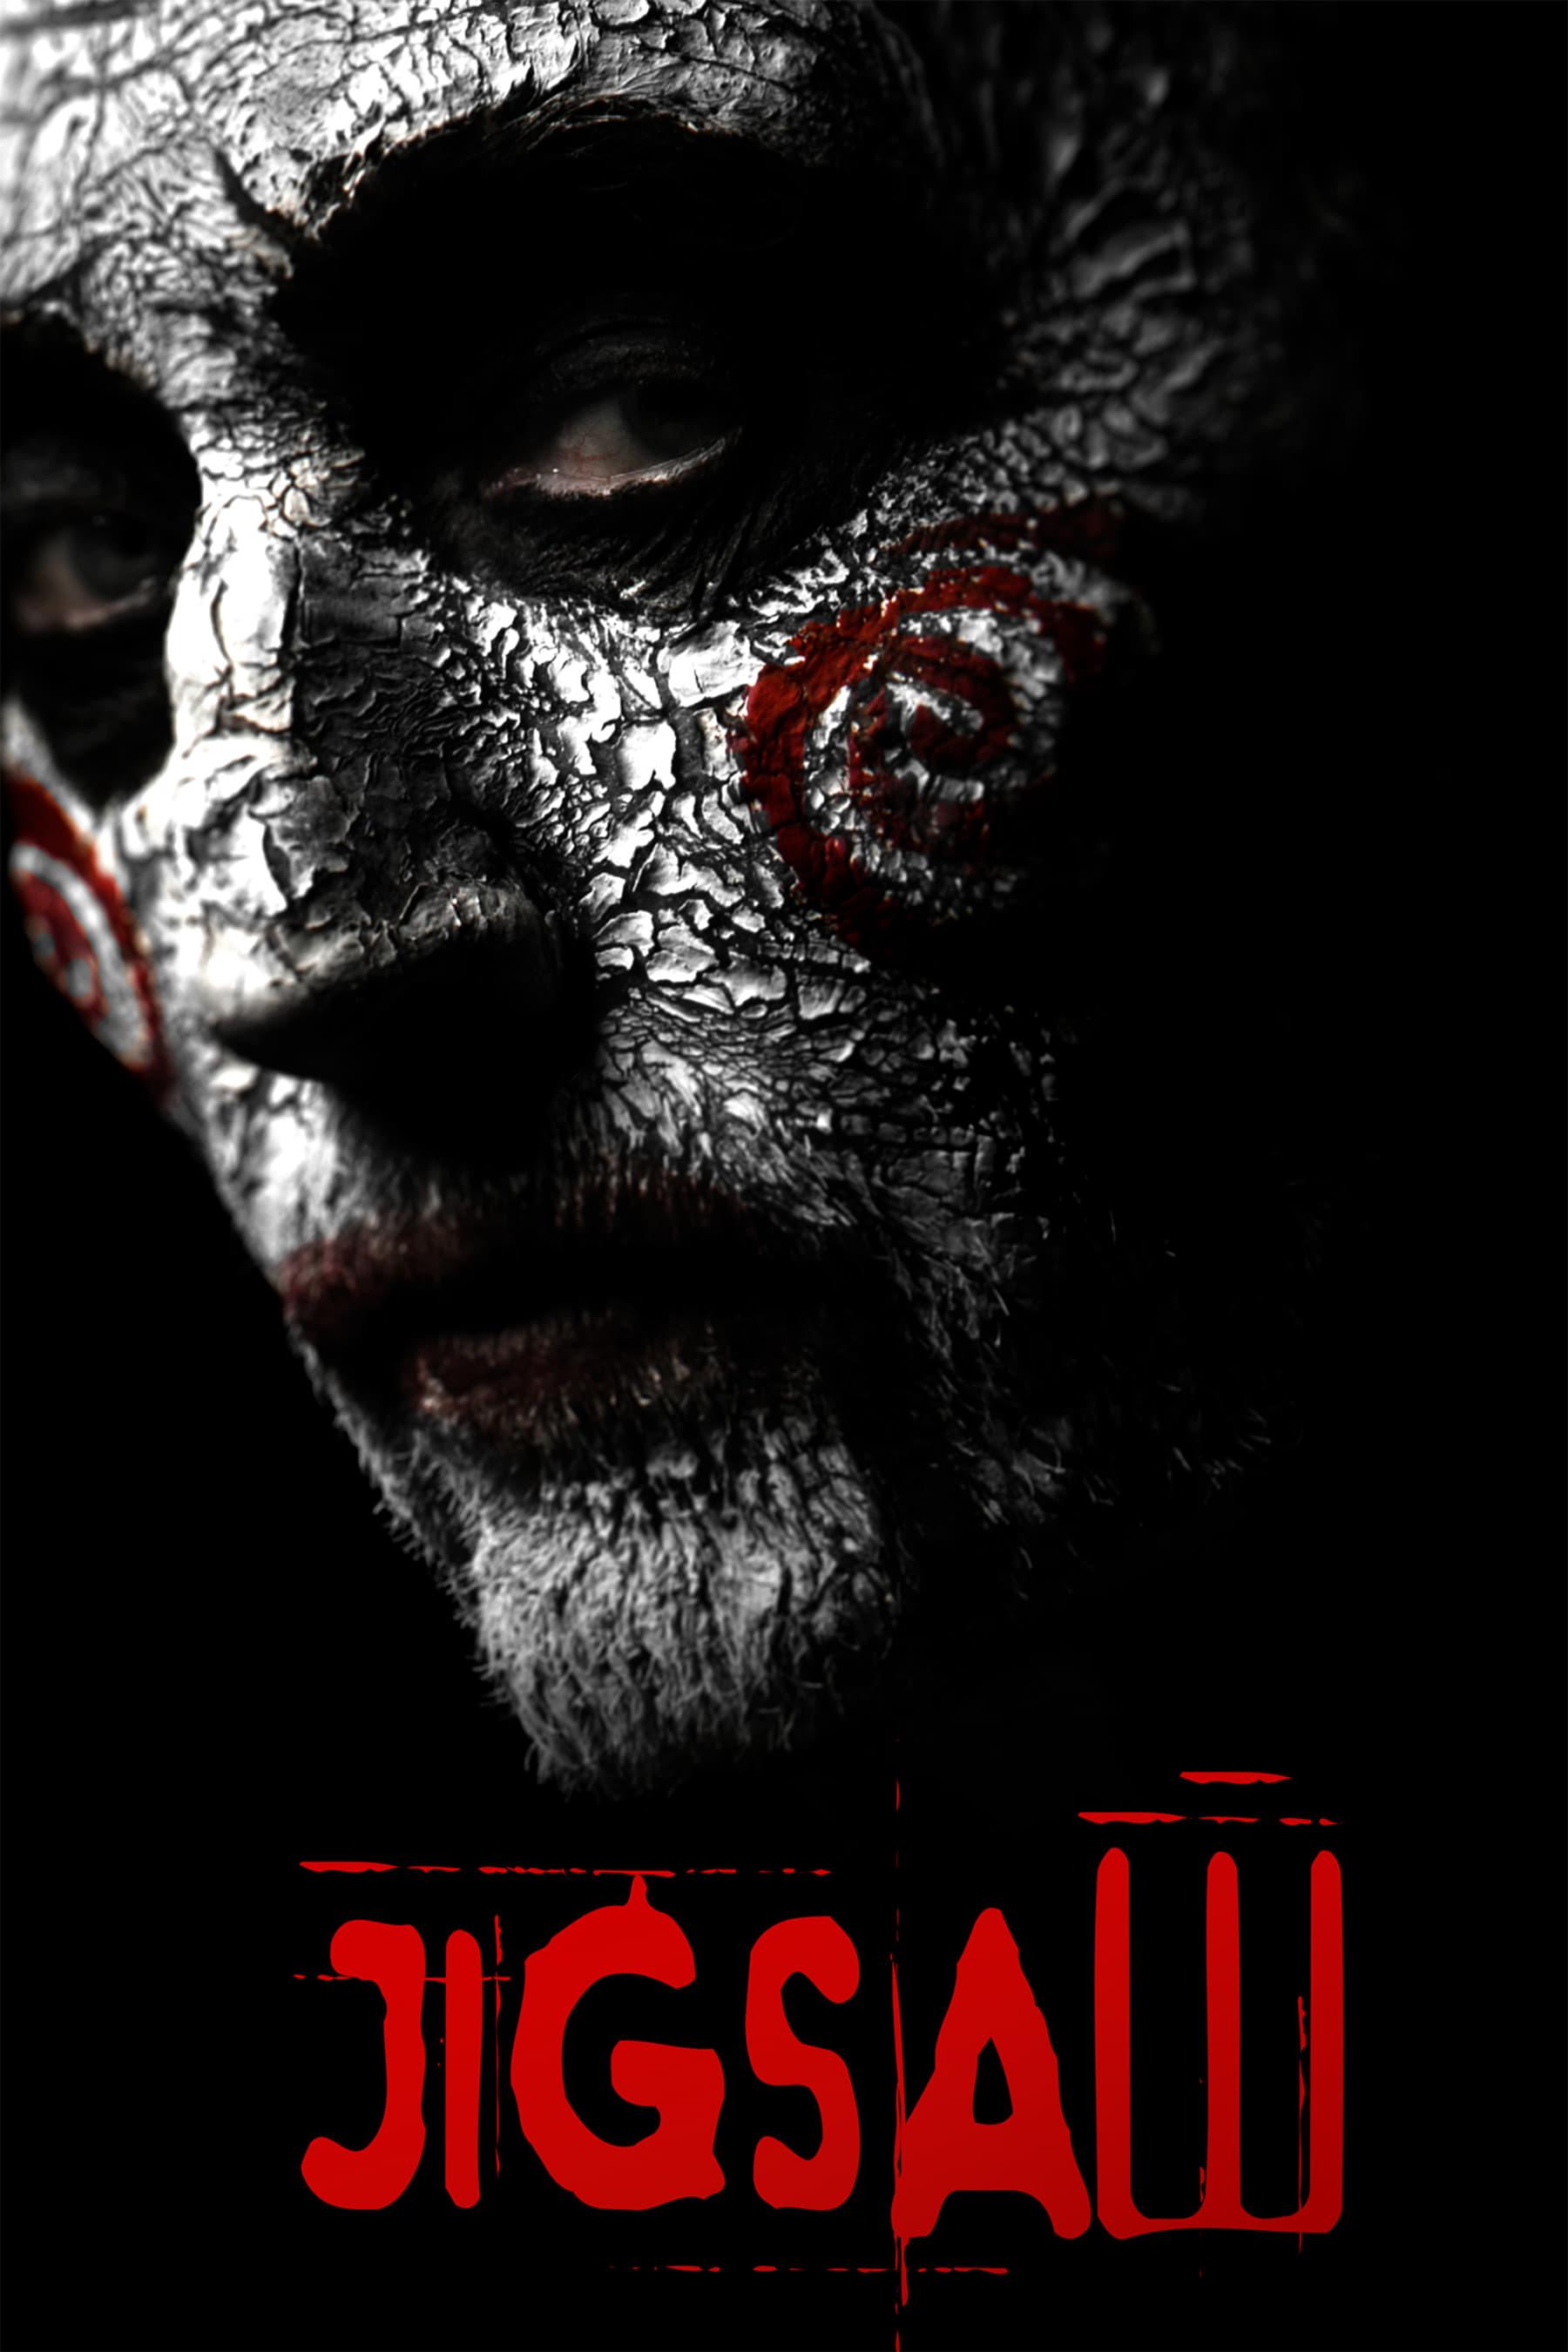 Jigsaw (Saw 8) Película Completa DVD [MEGA] [LATINO] 2017